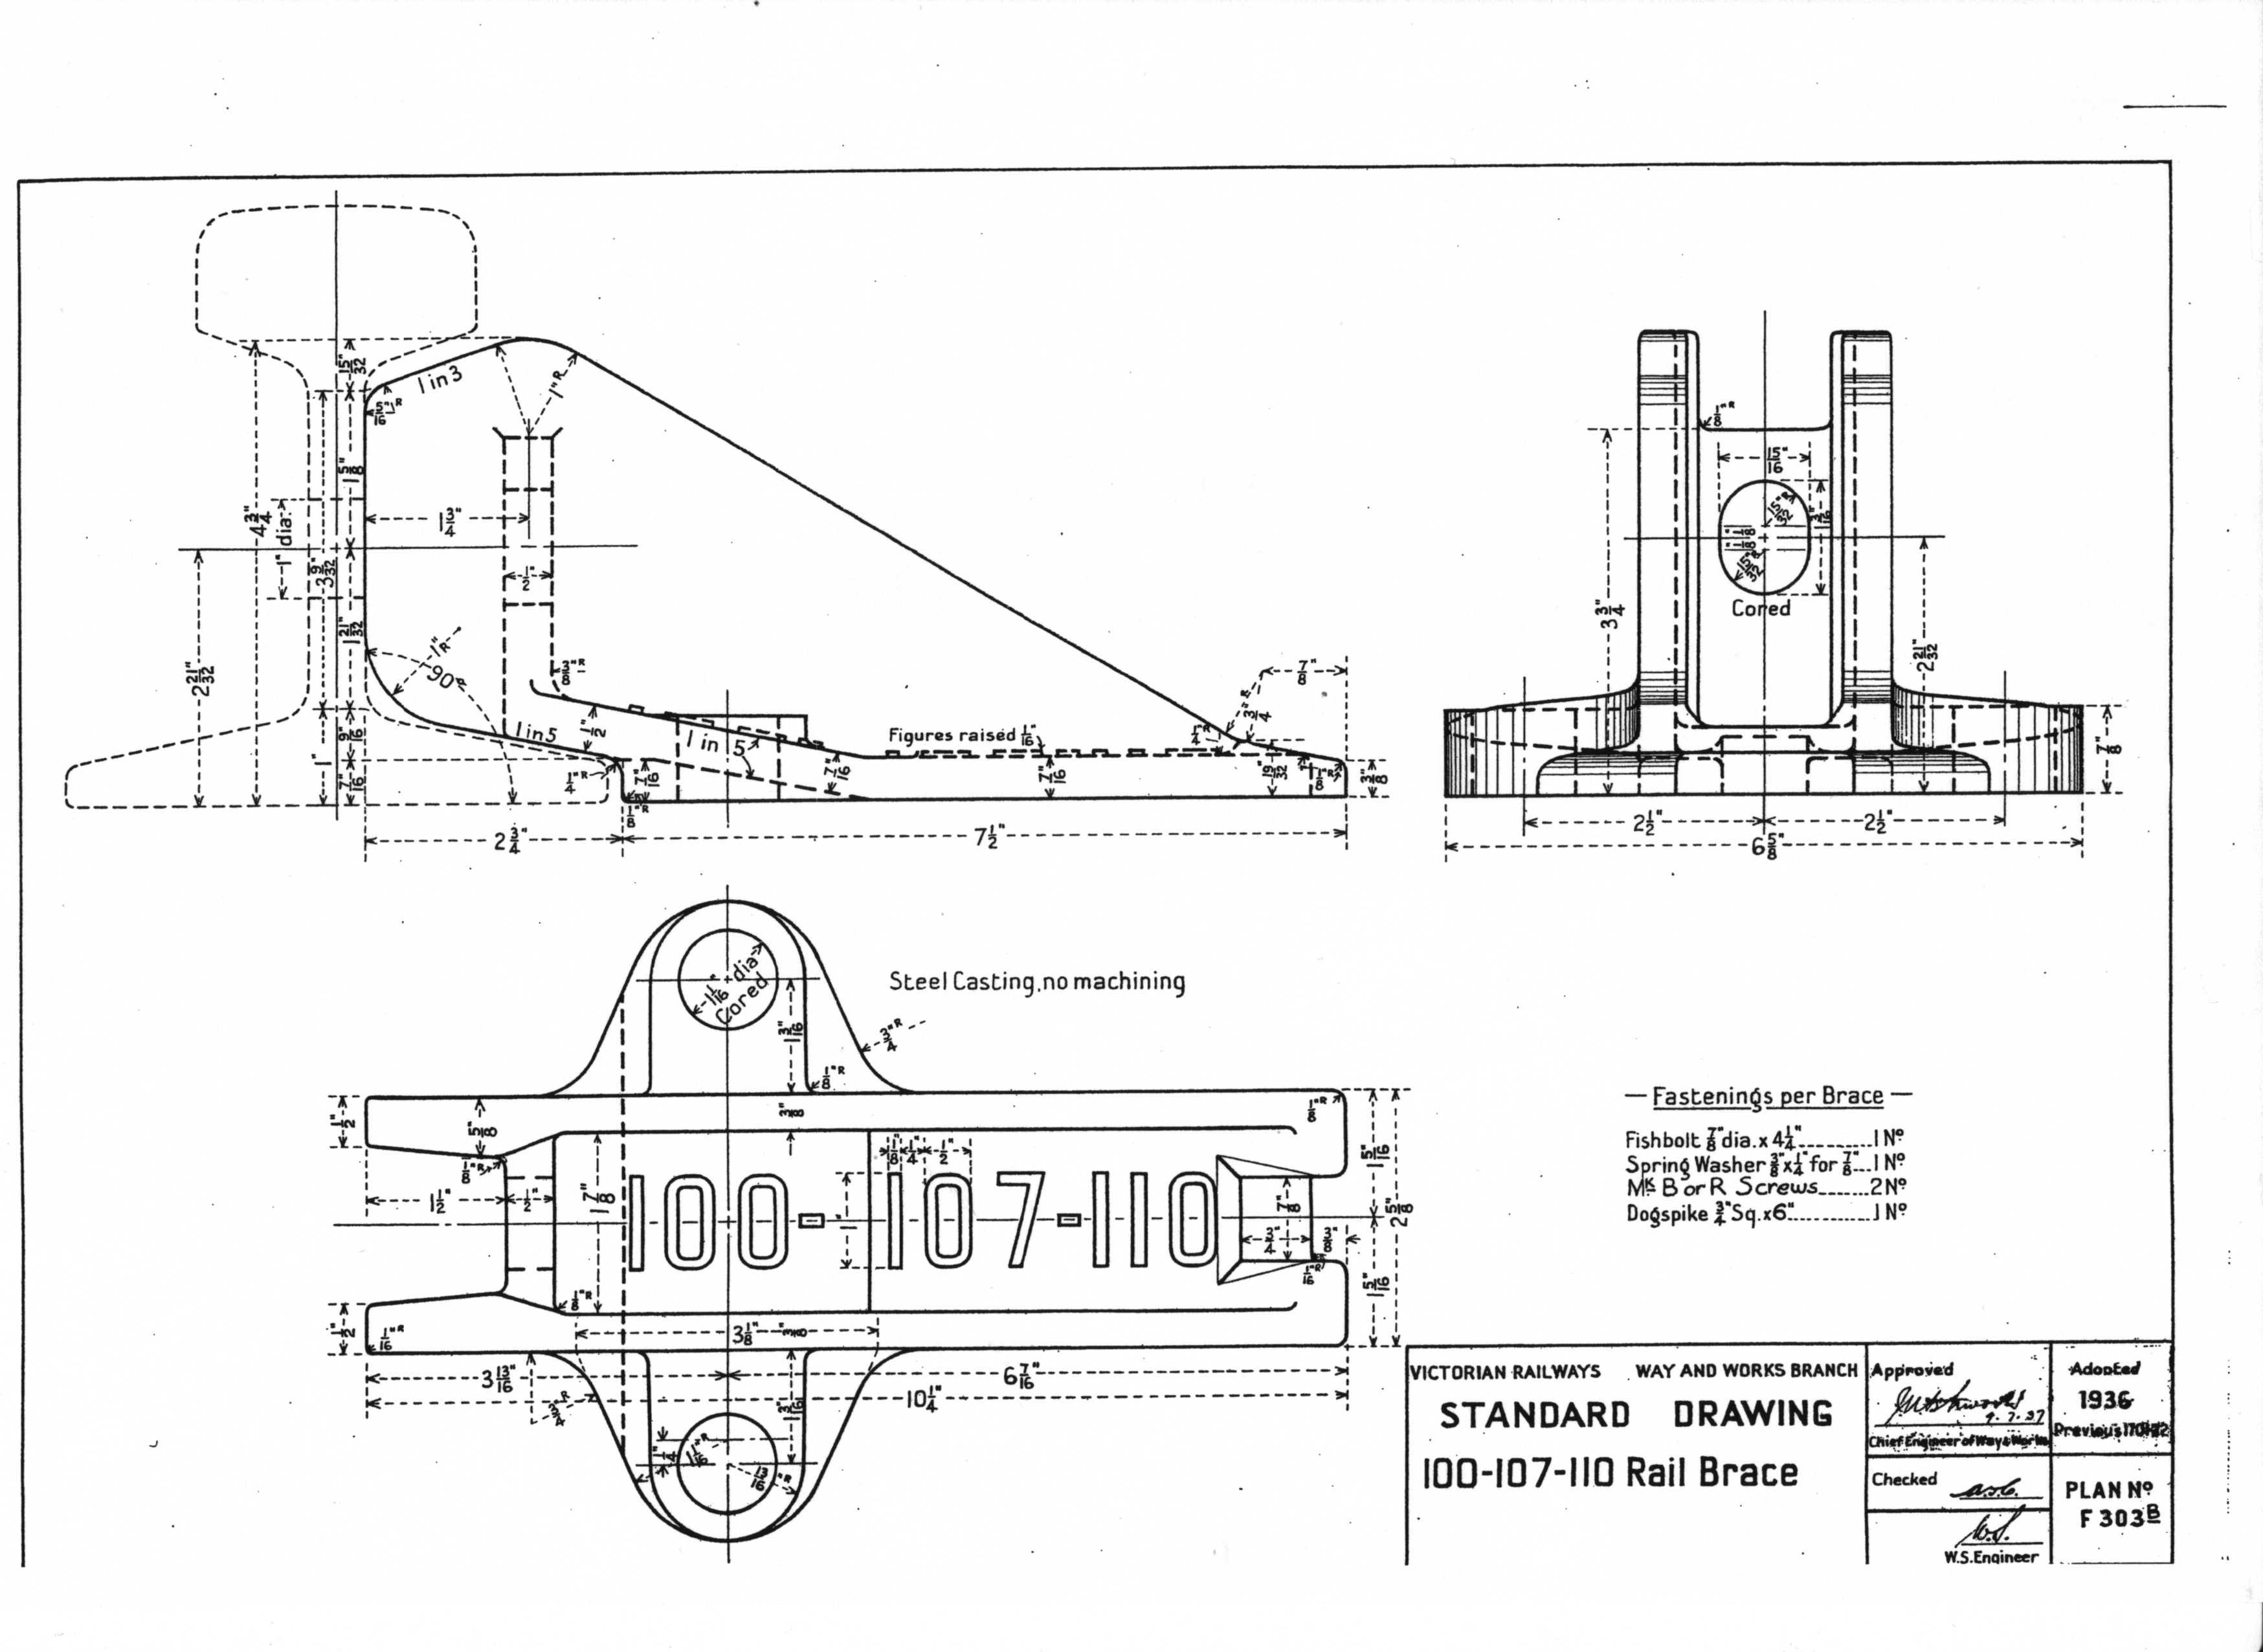 Victorian Railway Station Diagrams